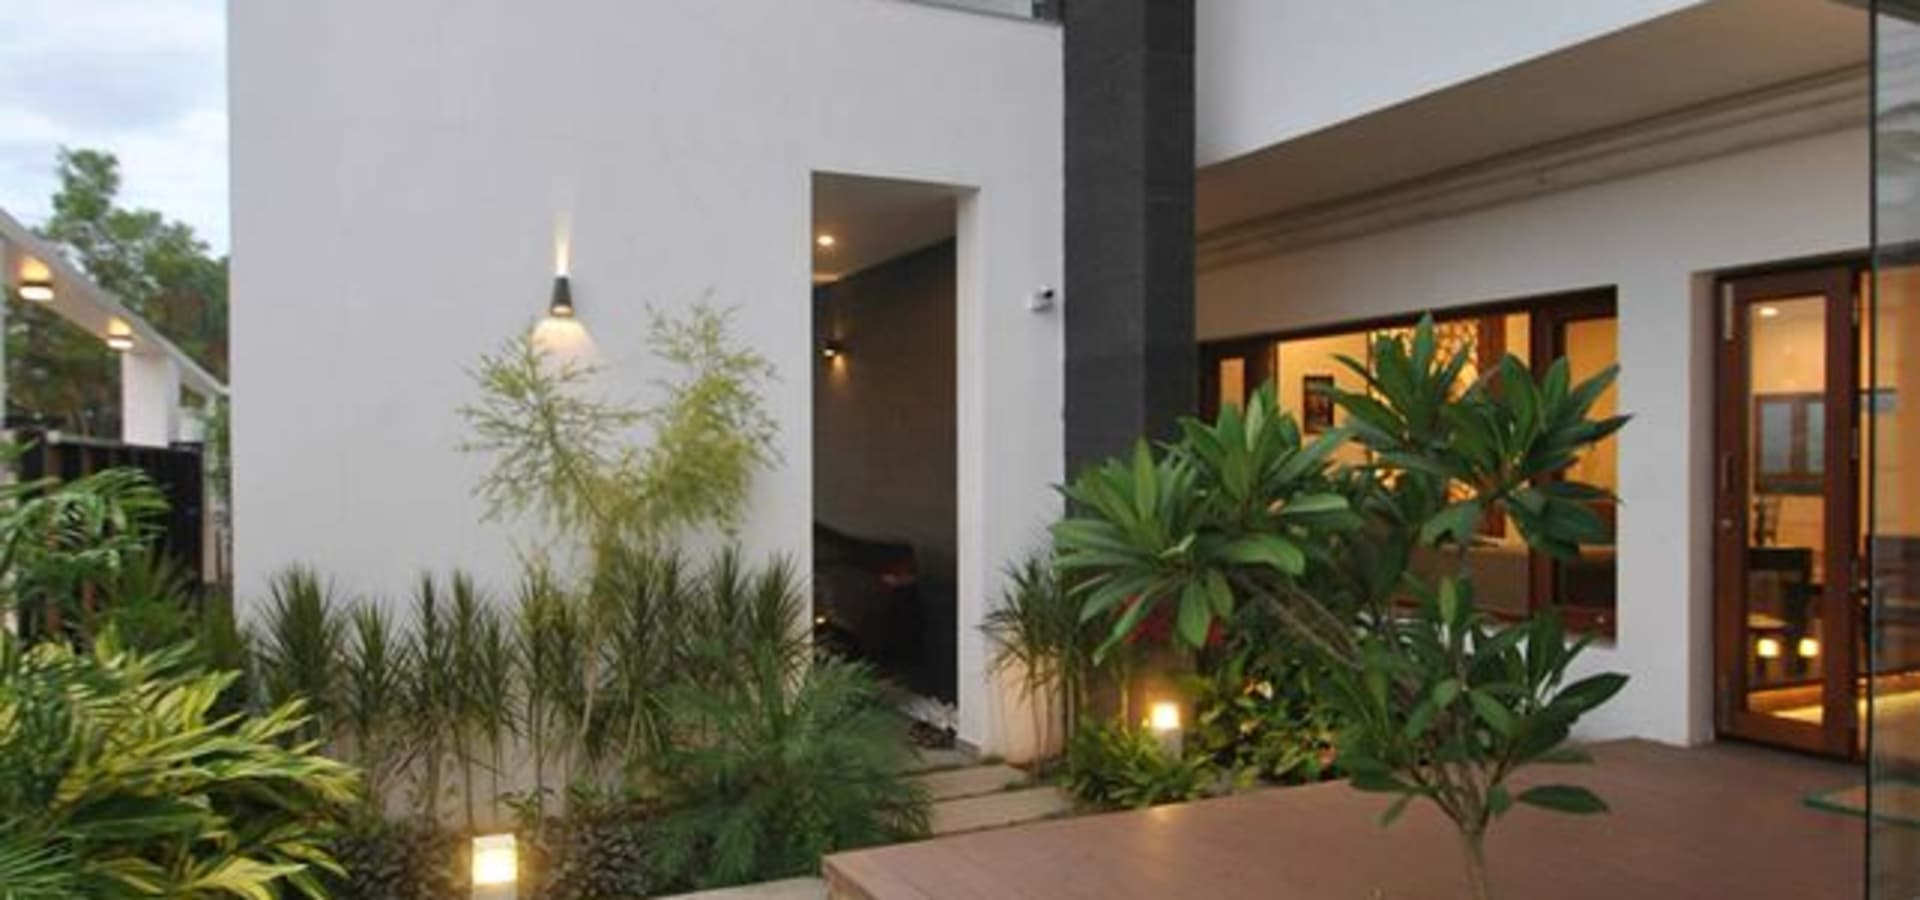 Murali architects